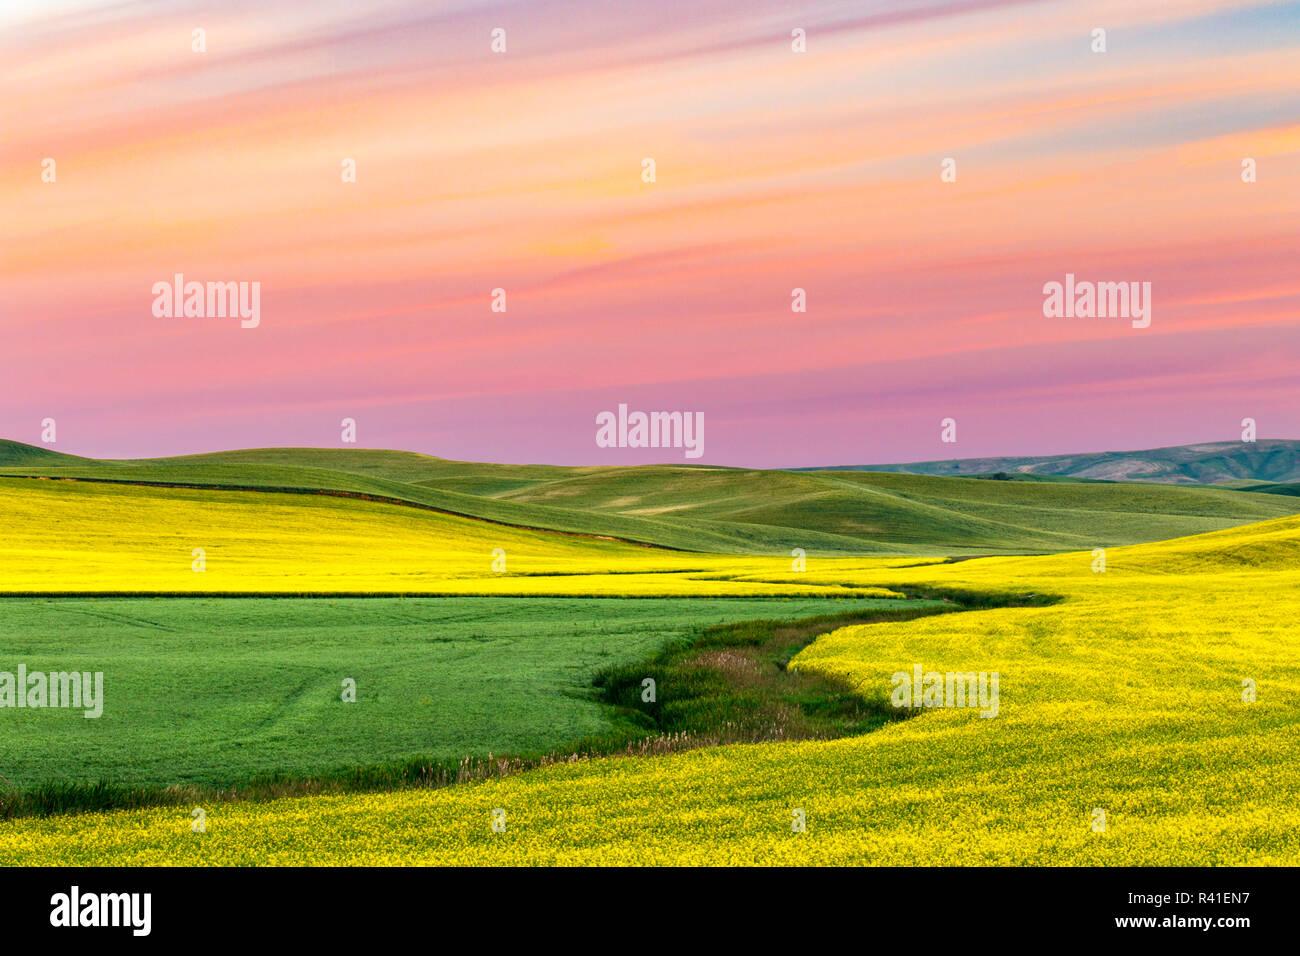 Yellow canola field at sunrise, Palouse near Pullman, Washington State. Stock Photo